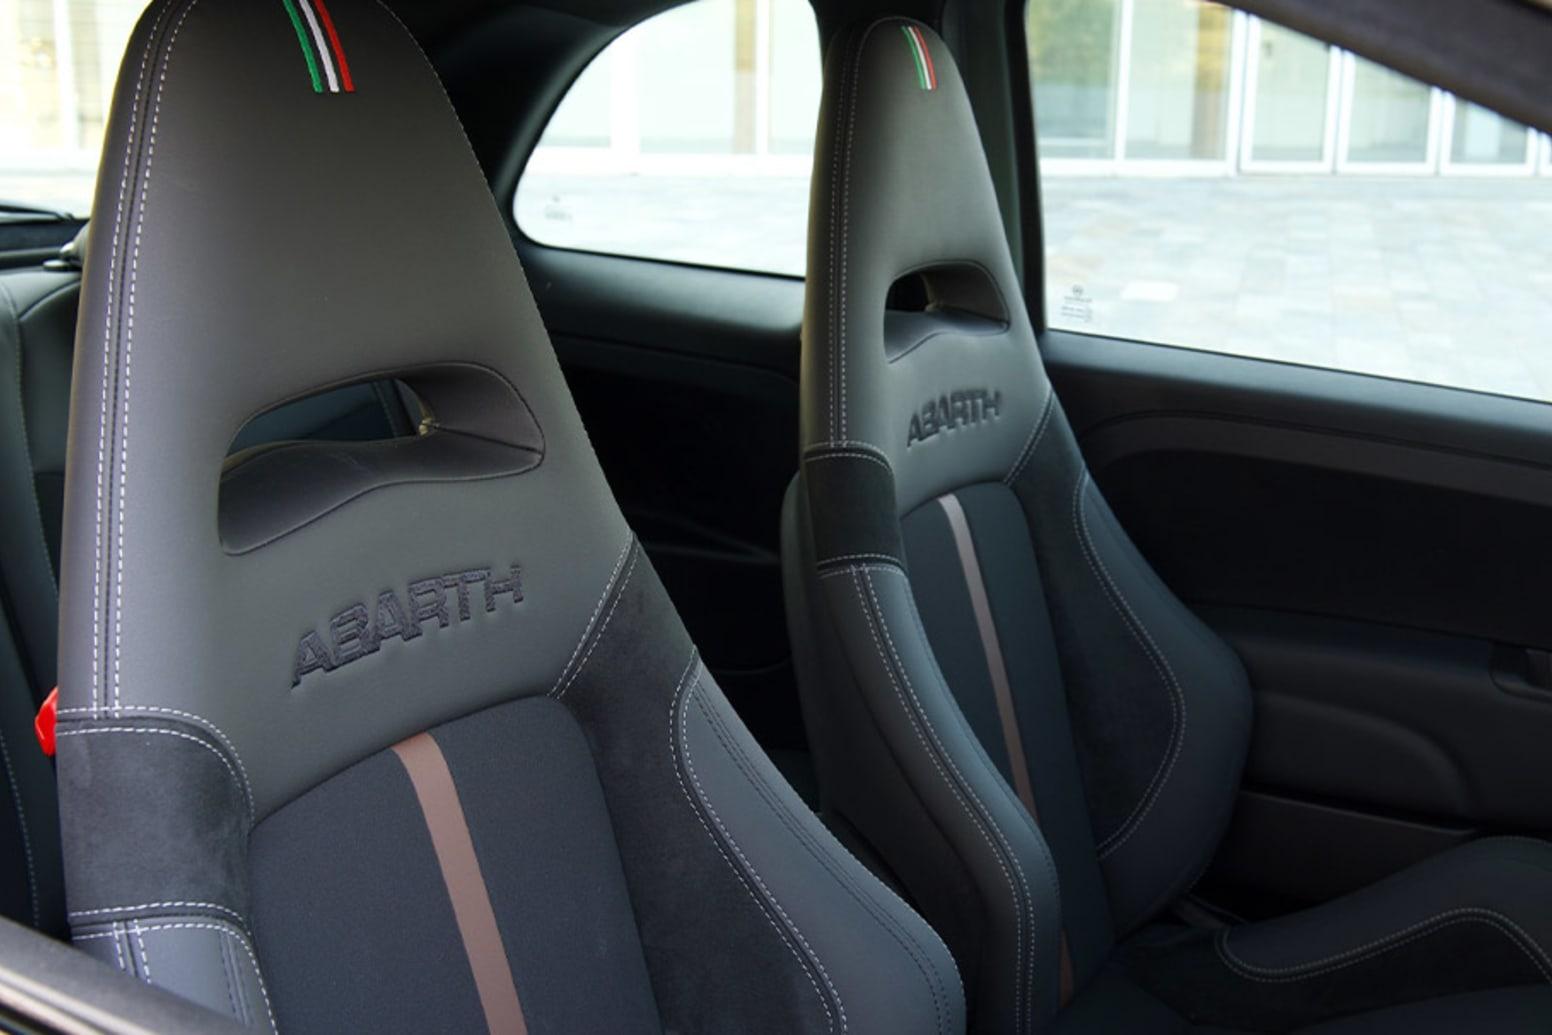 Abarth 695 Interior Seats